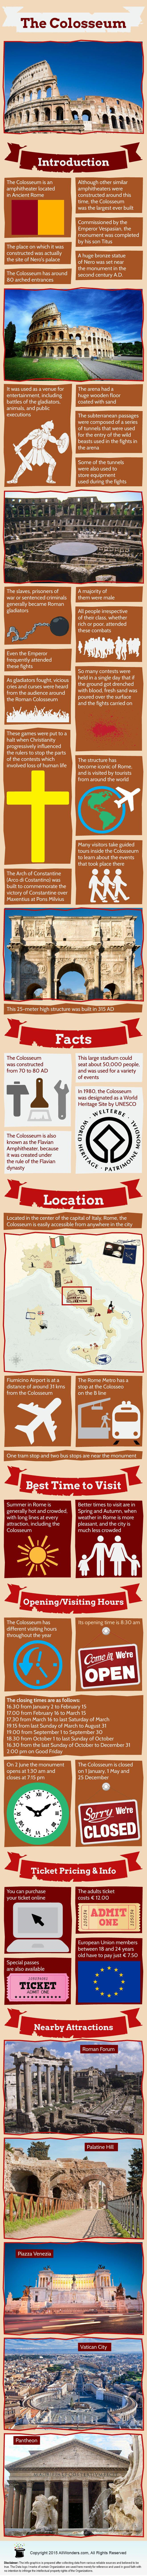 Colosseum Infographic